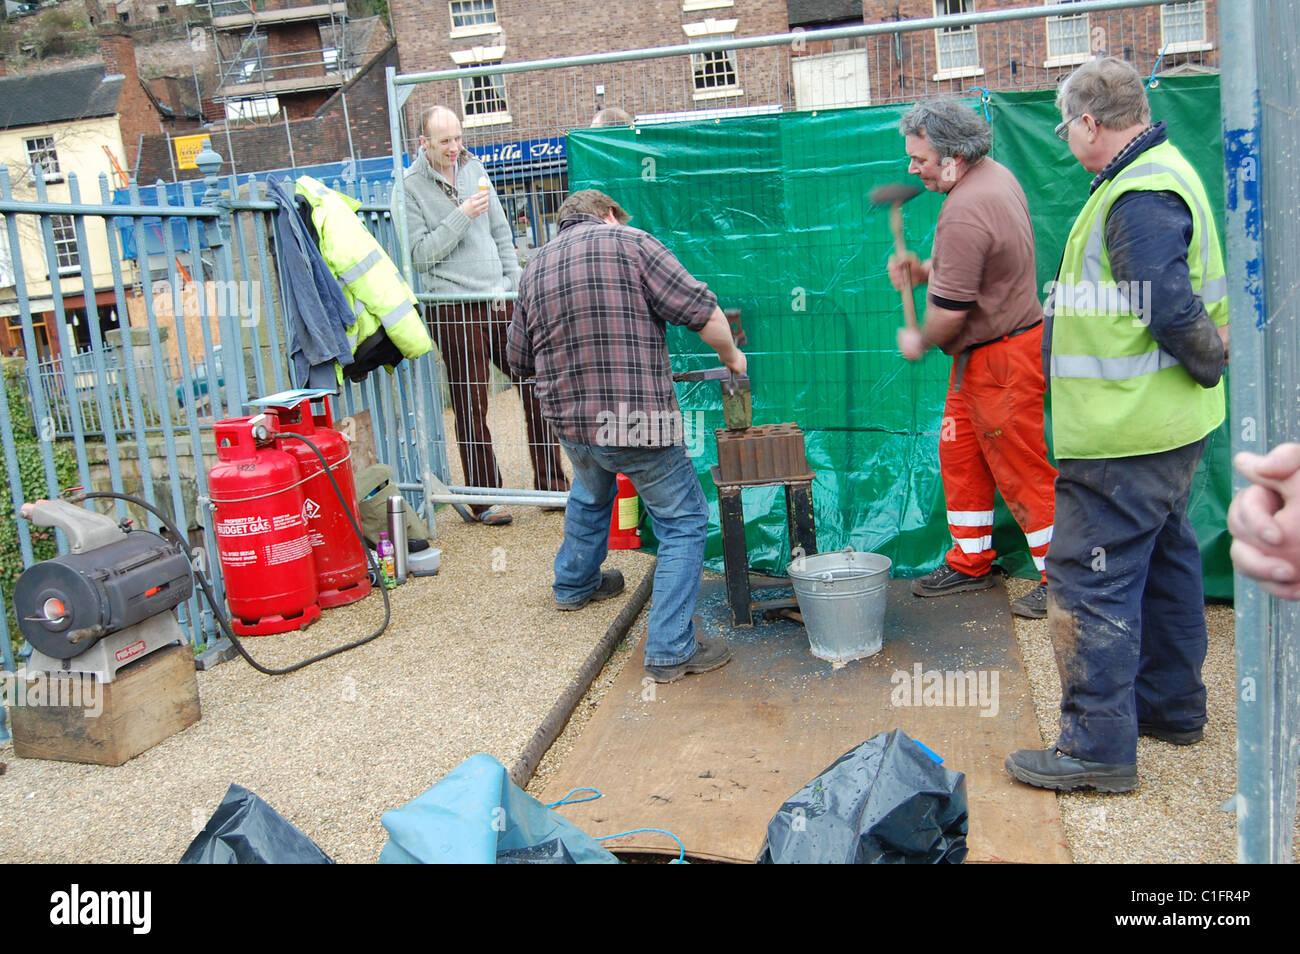 men at work in ironbridge, england - Stock Image